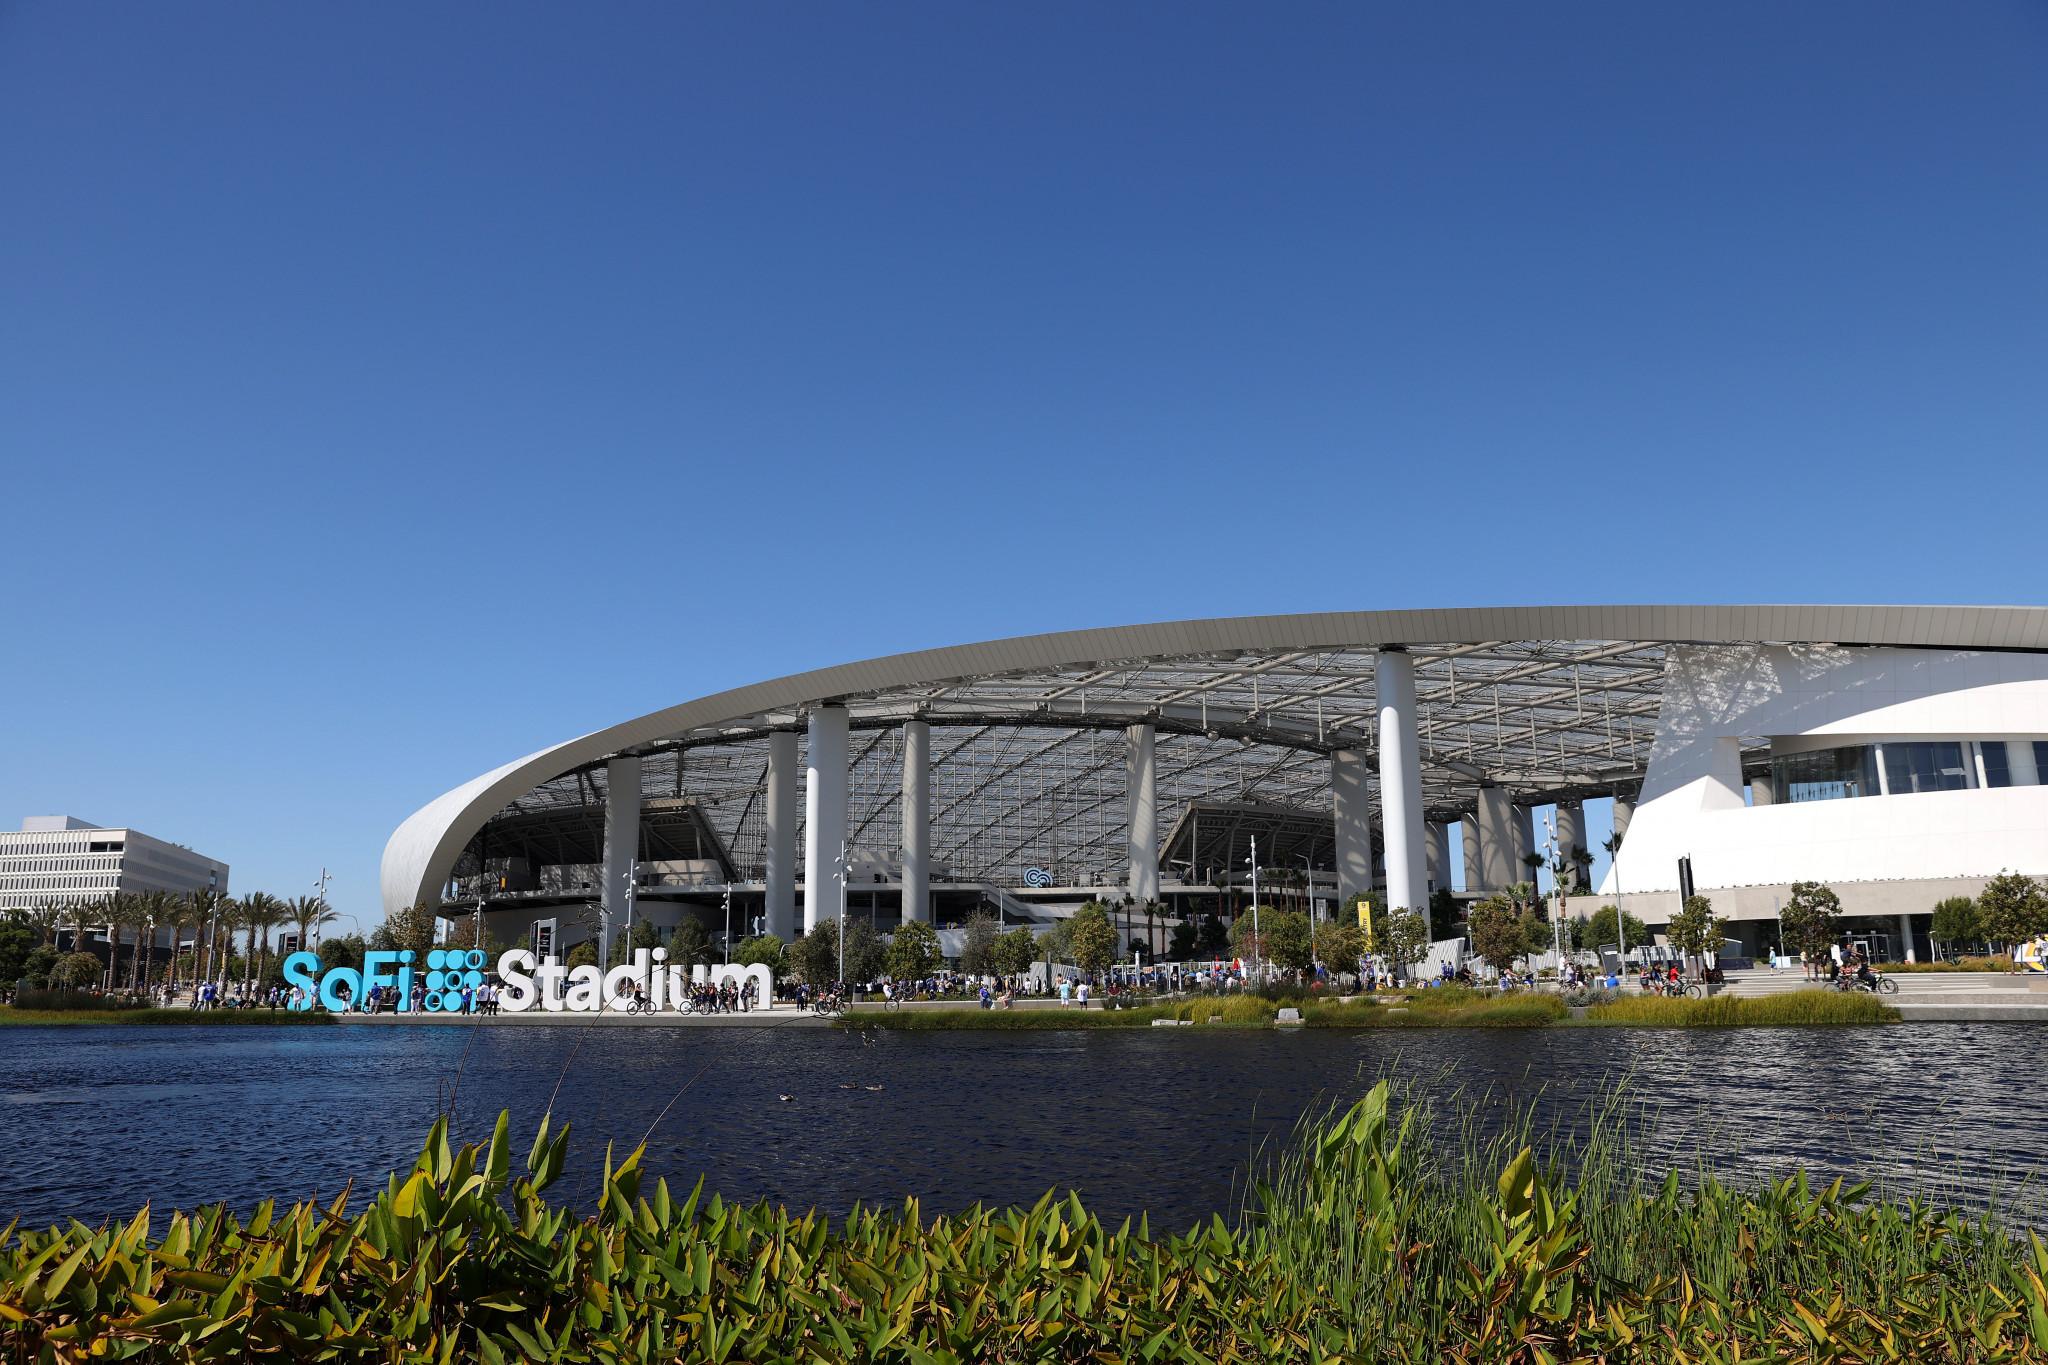 Los Angeles 2028 Ceremonies stadium proposed as World Cup host